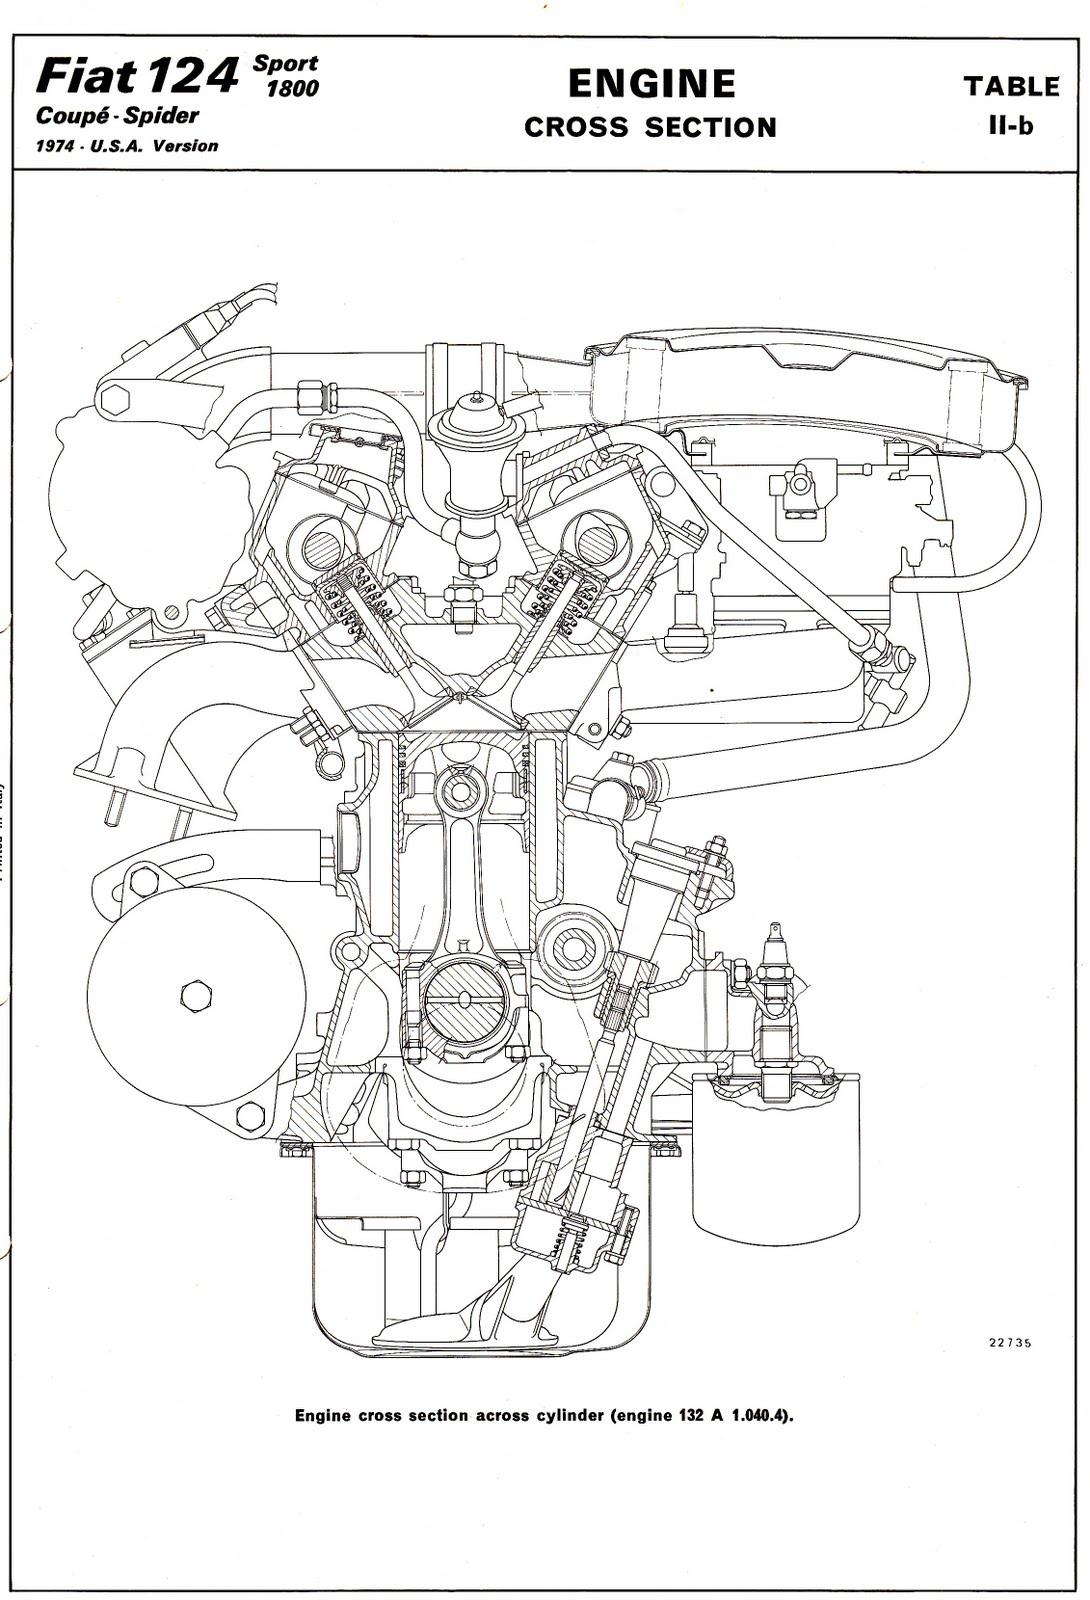 fiat 500 engine diagram simple wiring diagram rh 48 mara cujas de 79 fiat spyder engine [ 1090 x 1600 Pixel ]